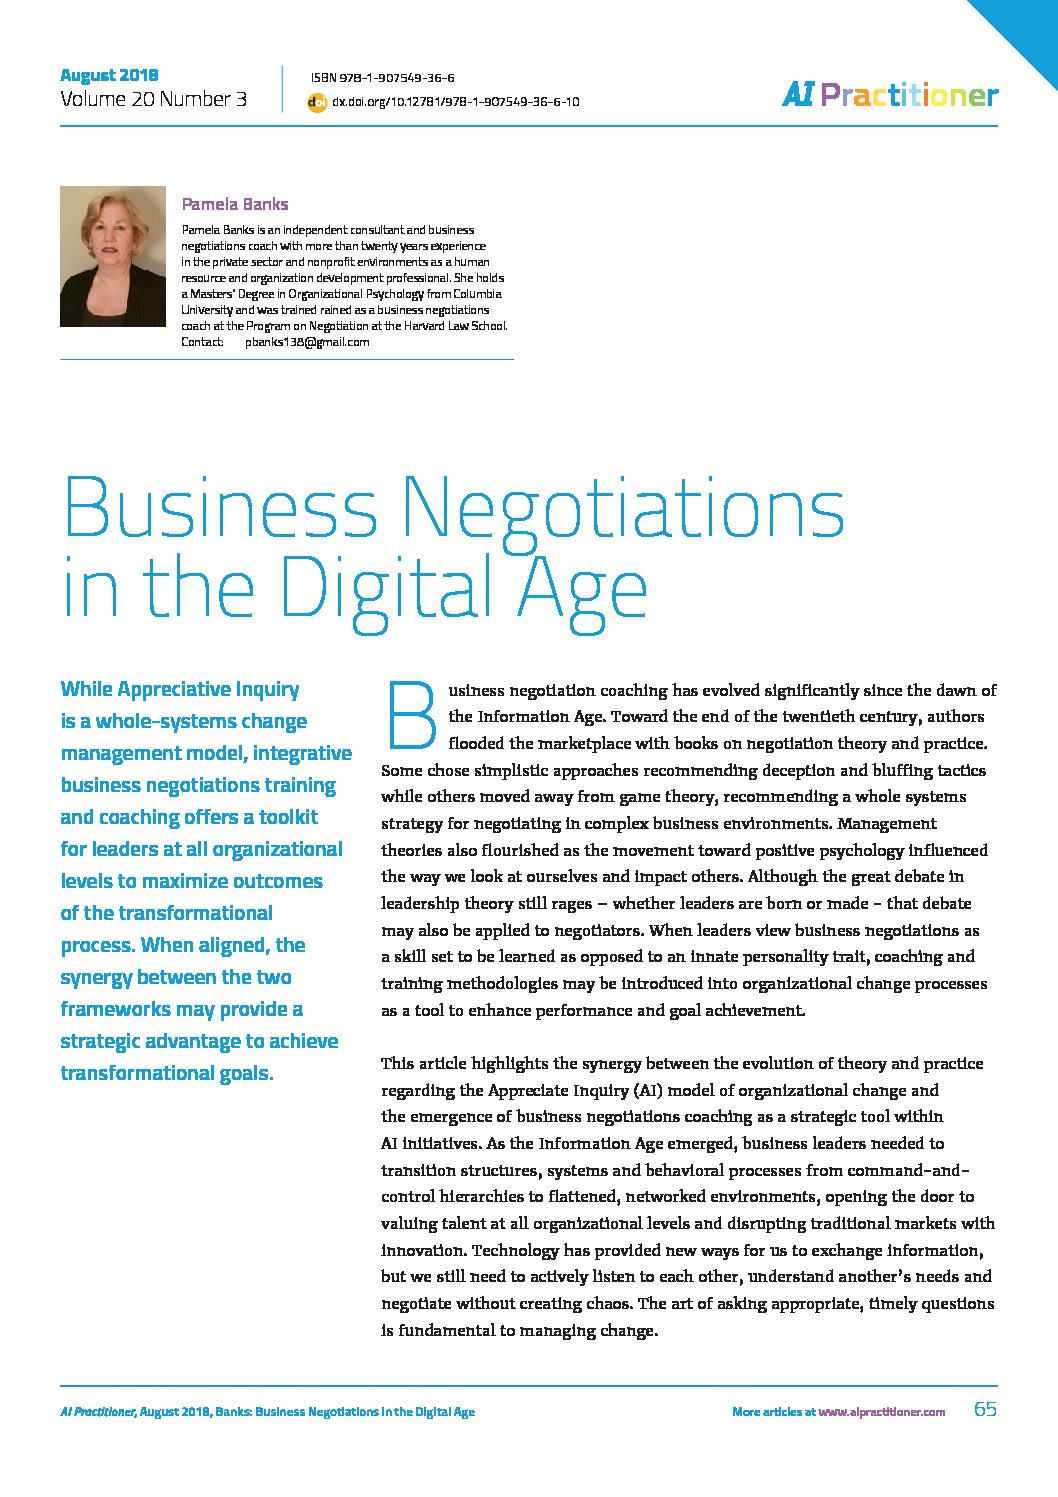 aip-august18-appreciative-voice-business-negotiations